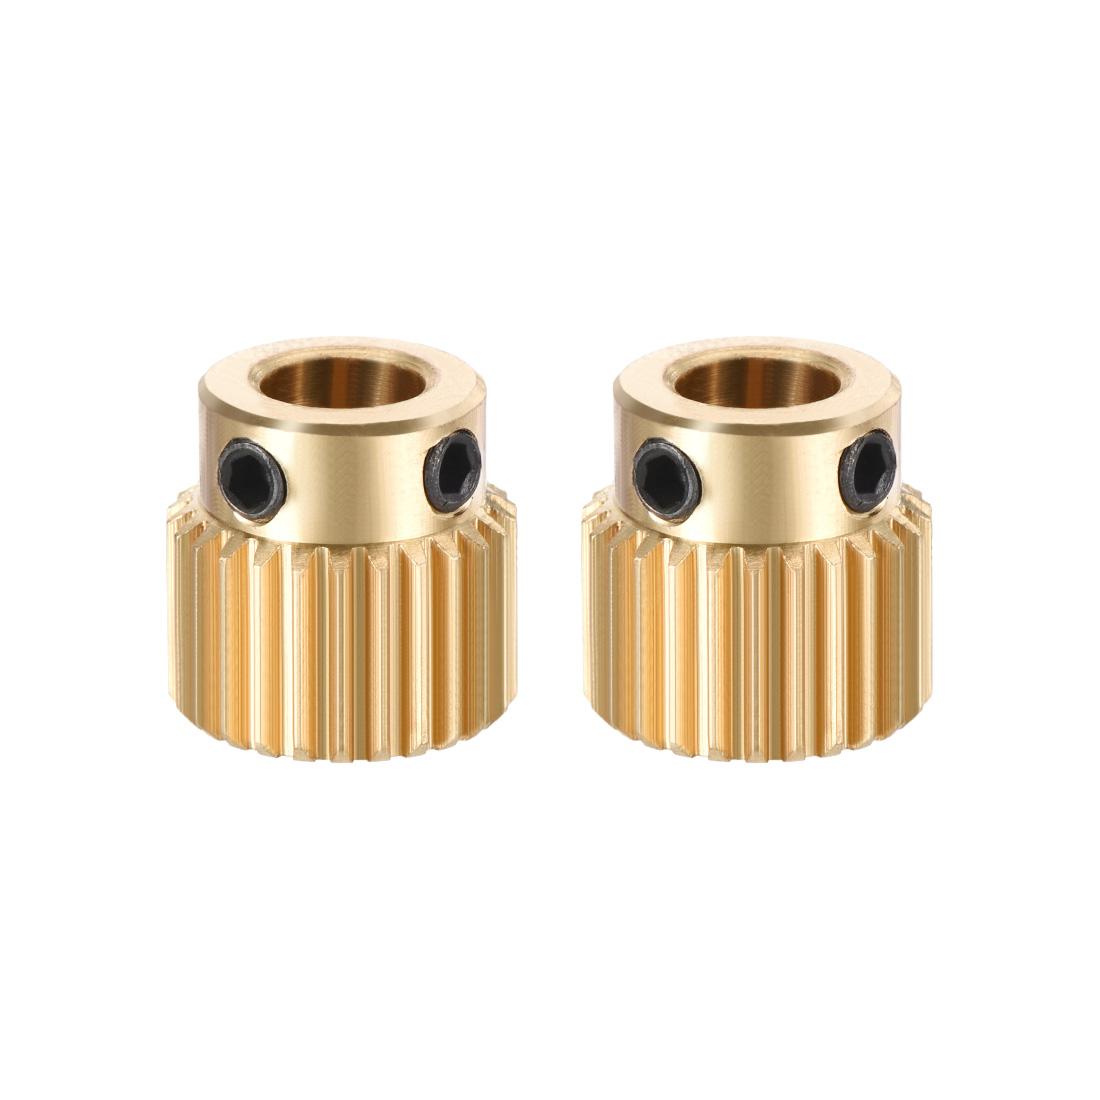 Brass Drive Gear Extruder Wheel 26 Teeth 5mm Bore 2pcs